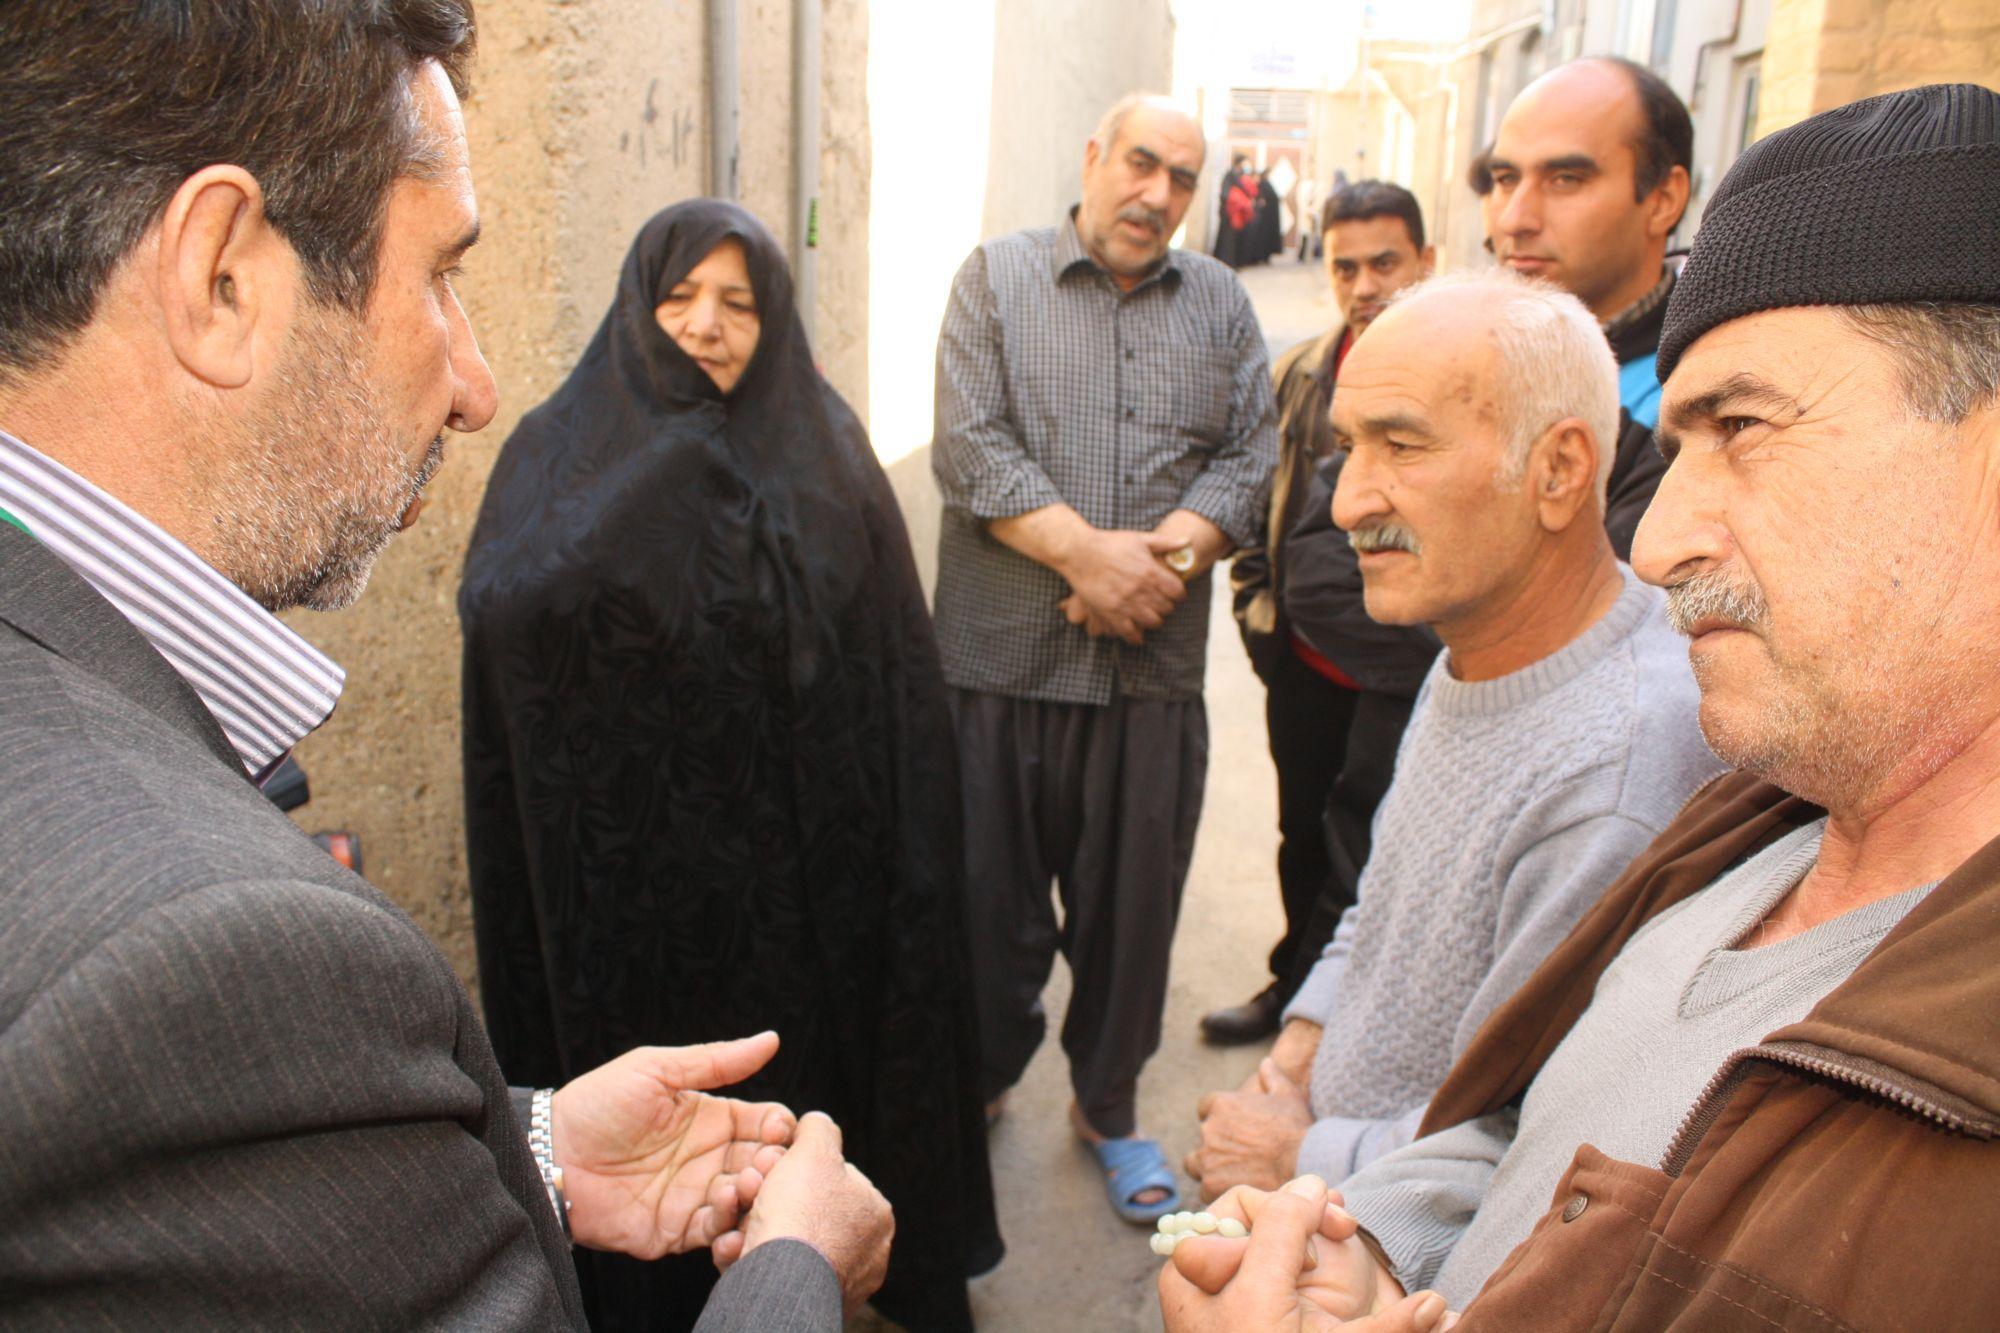 سومین طرح ورامین گردی رییس شورای اسلامی شهر ورامین +گزارش تصویری